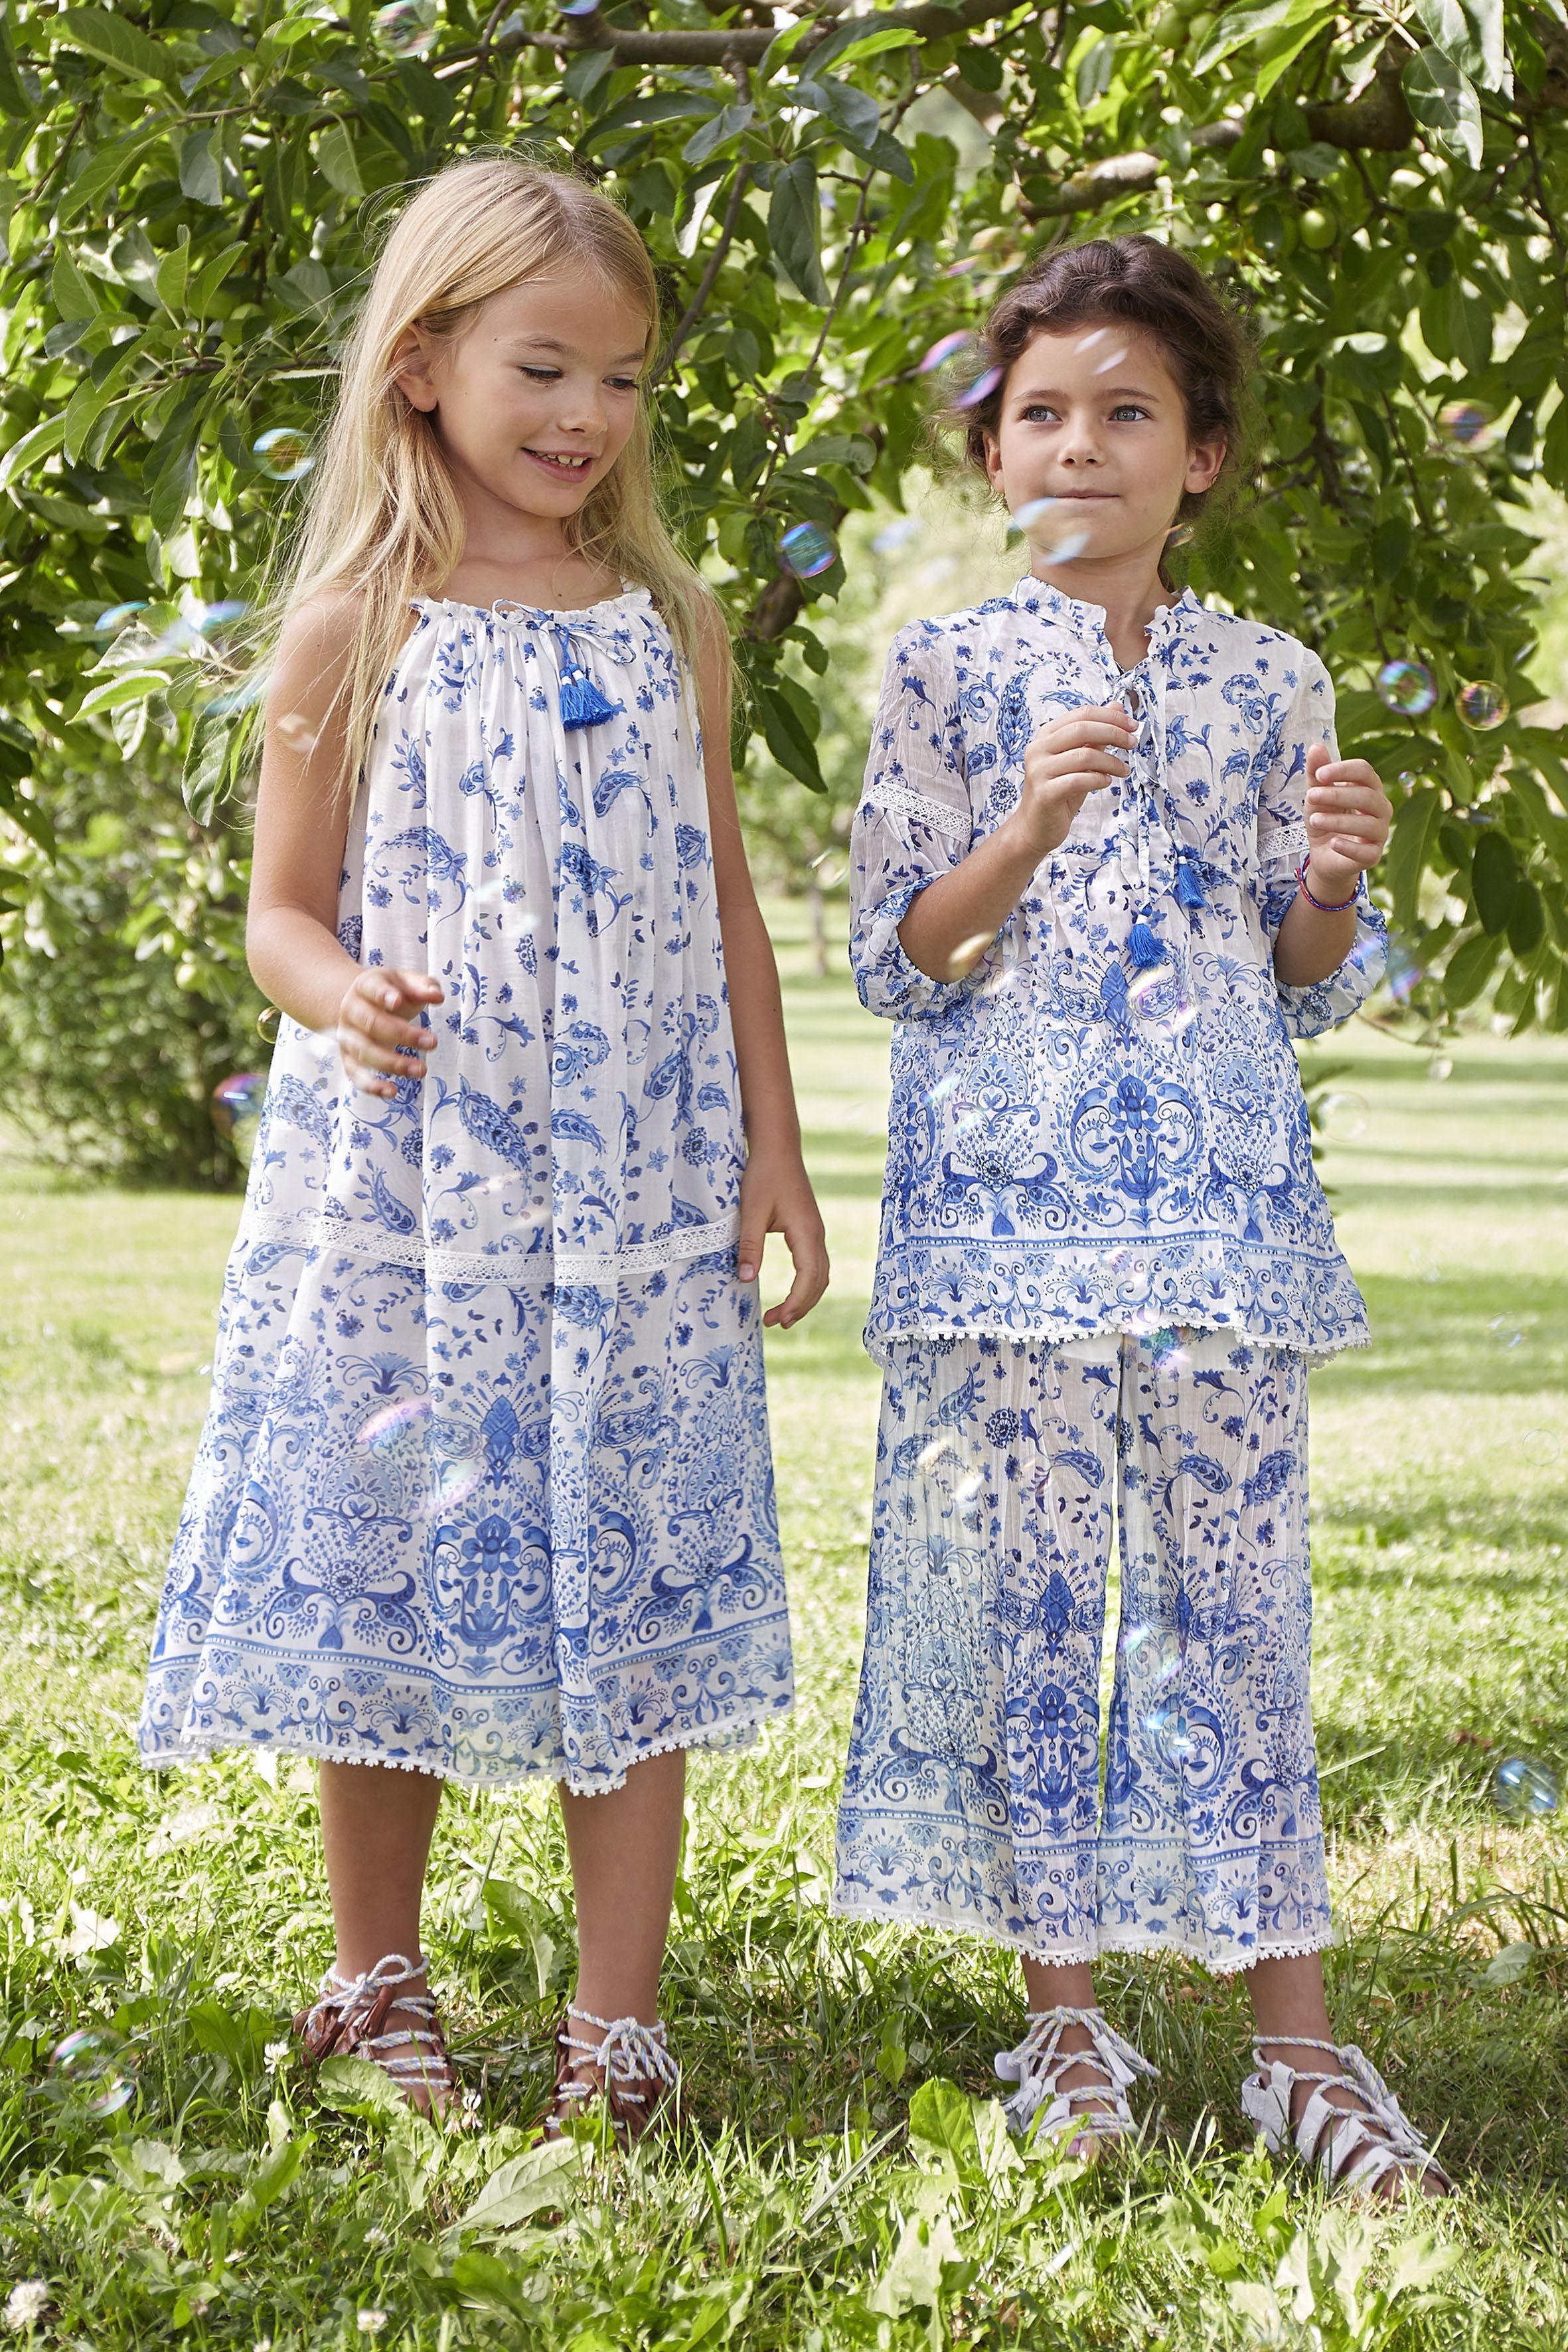 Junior SS18 - Lookbook   niñas primavera-verano   Pinterest   Mädchen